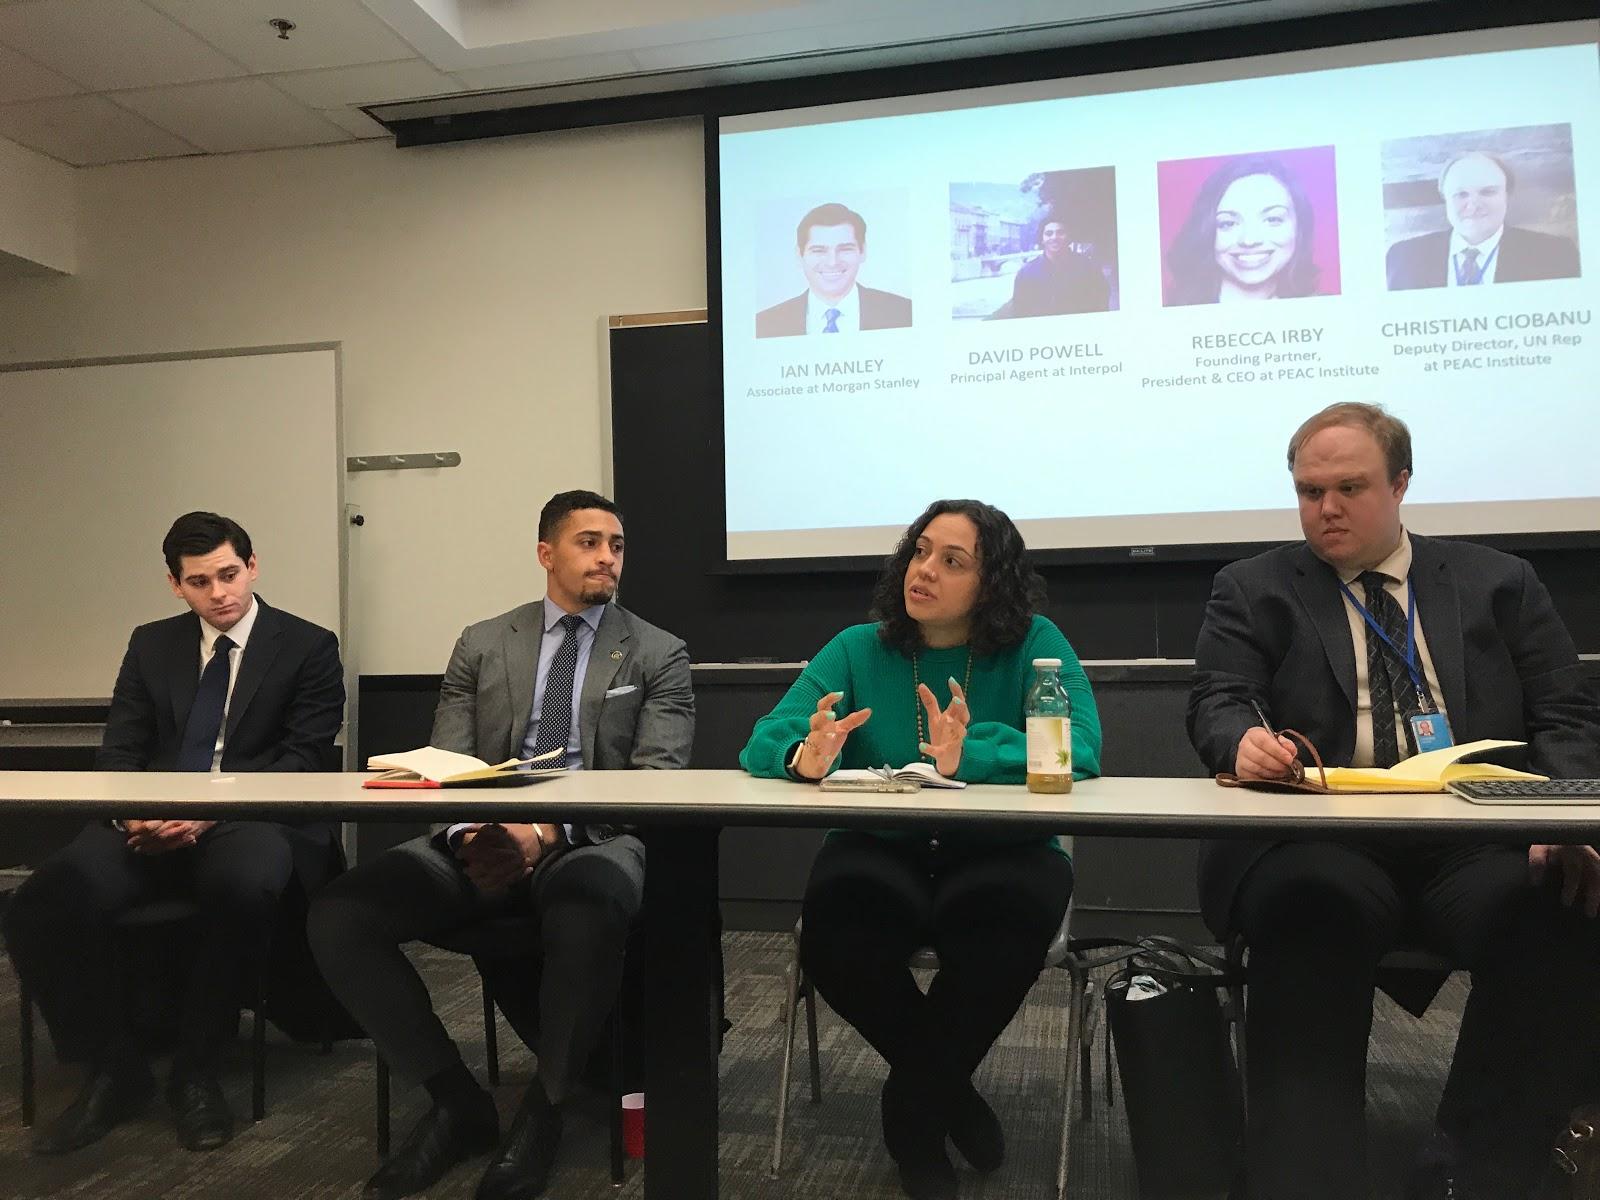 Ian Manley (far left), David Powell (left), Rebecca Irby (right), and Christian Ciobanu (far-right) Photo: Danny Hegberg